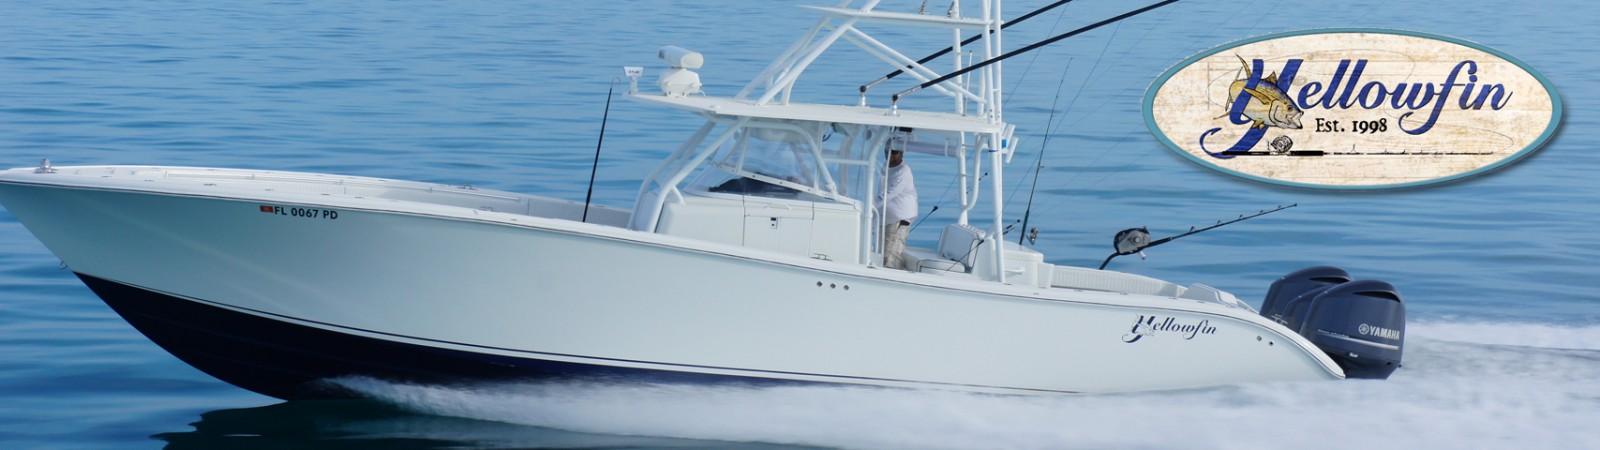 yellowfin-yachts